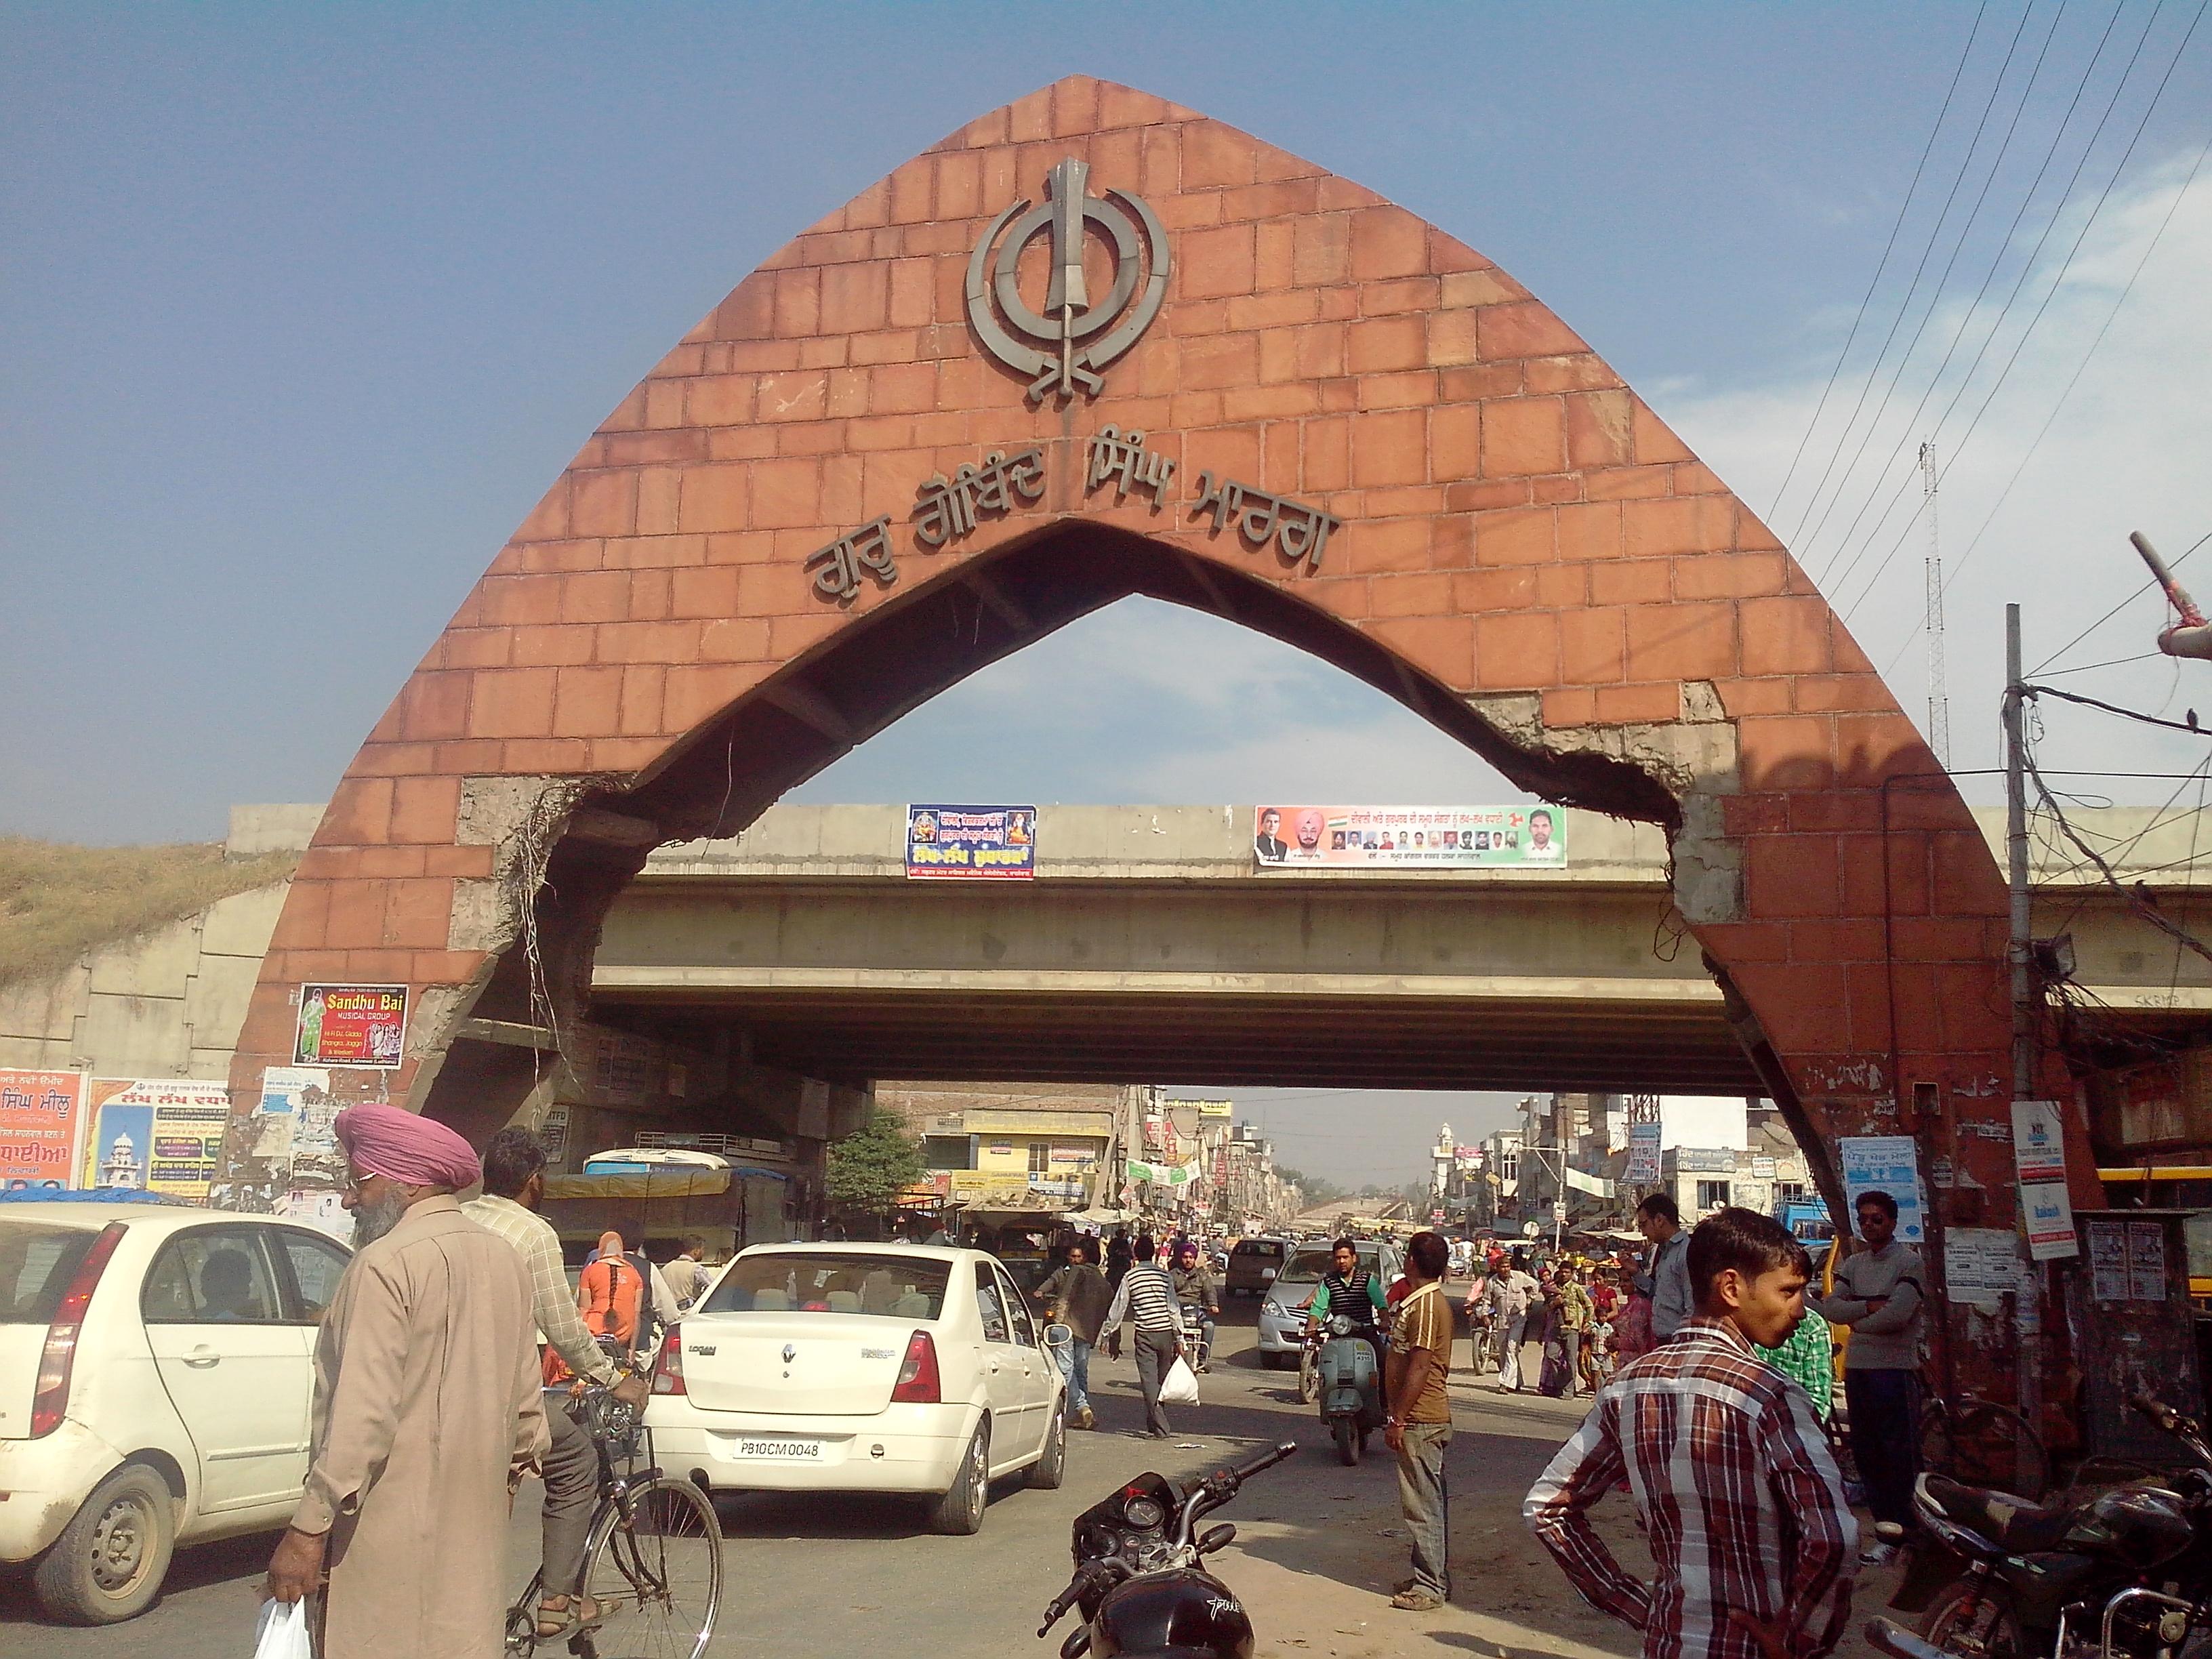 Ludhiana India  city images : Sahnewal, Ludhiana, Punjab, India Wikimedia Commons